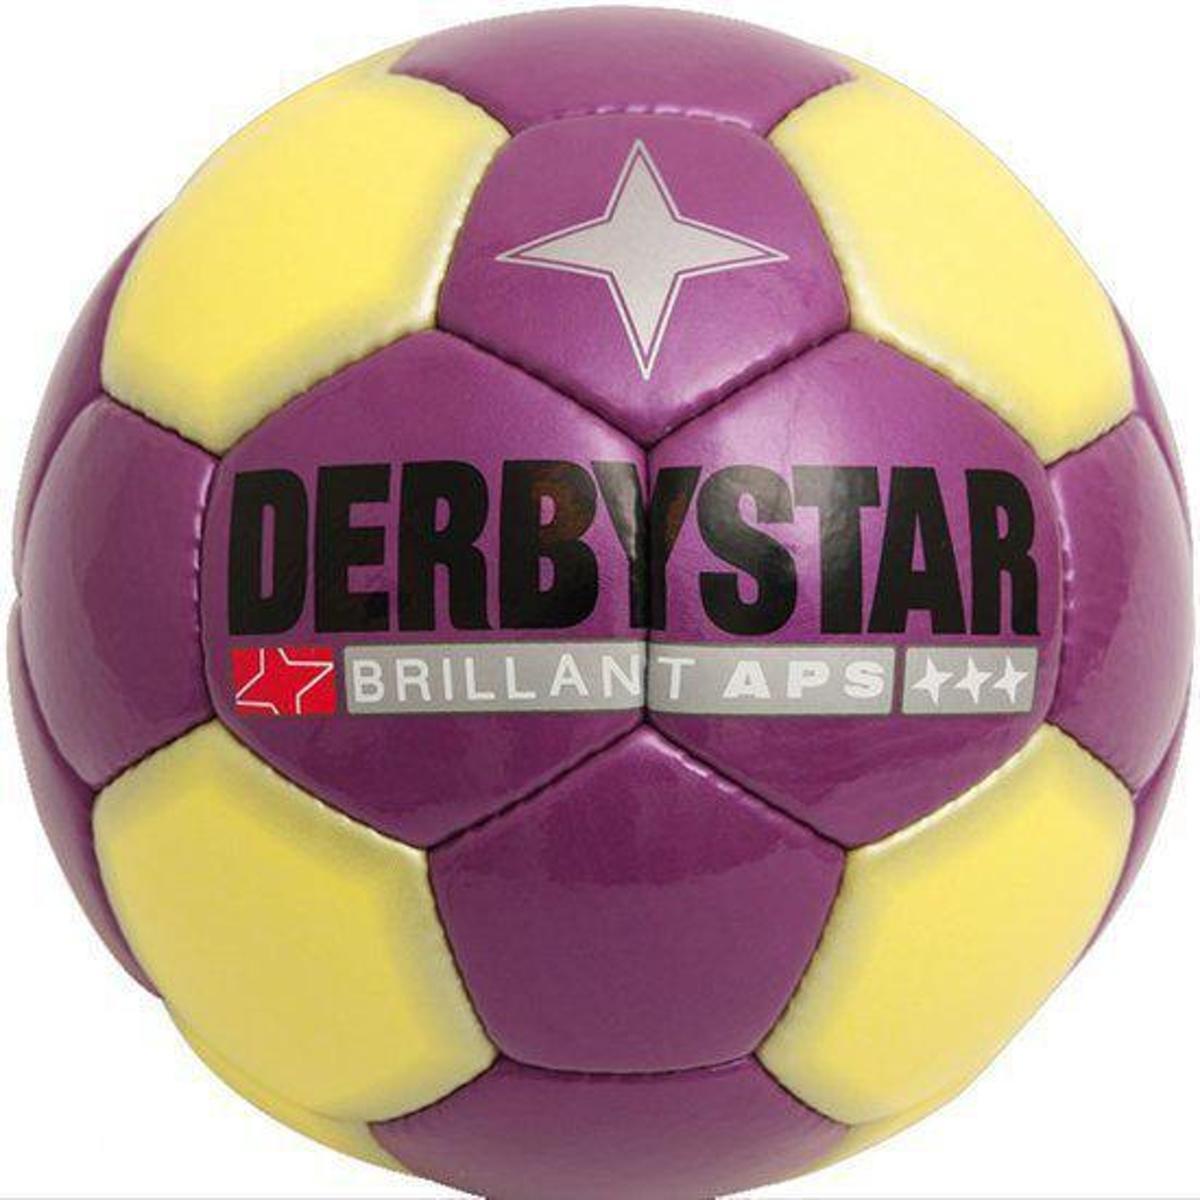 Derbystar Brillant Snow - Voetbal - 5 - Paars / Geel